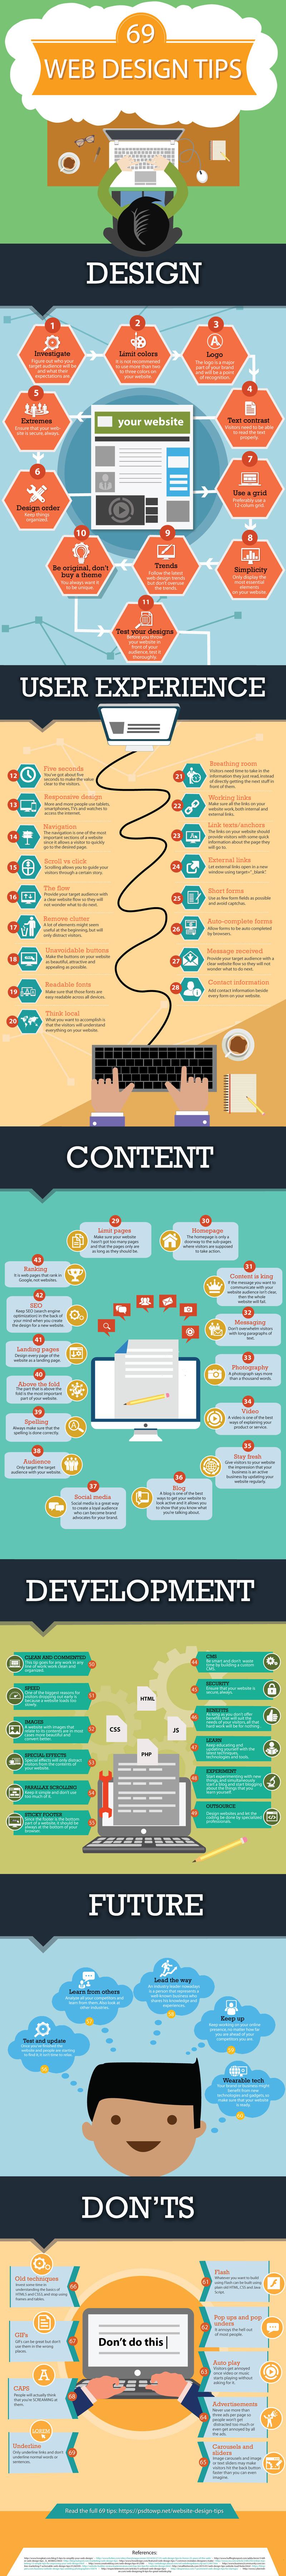 web-design-tips-infographic